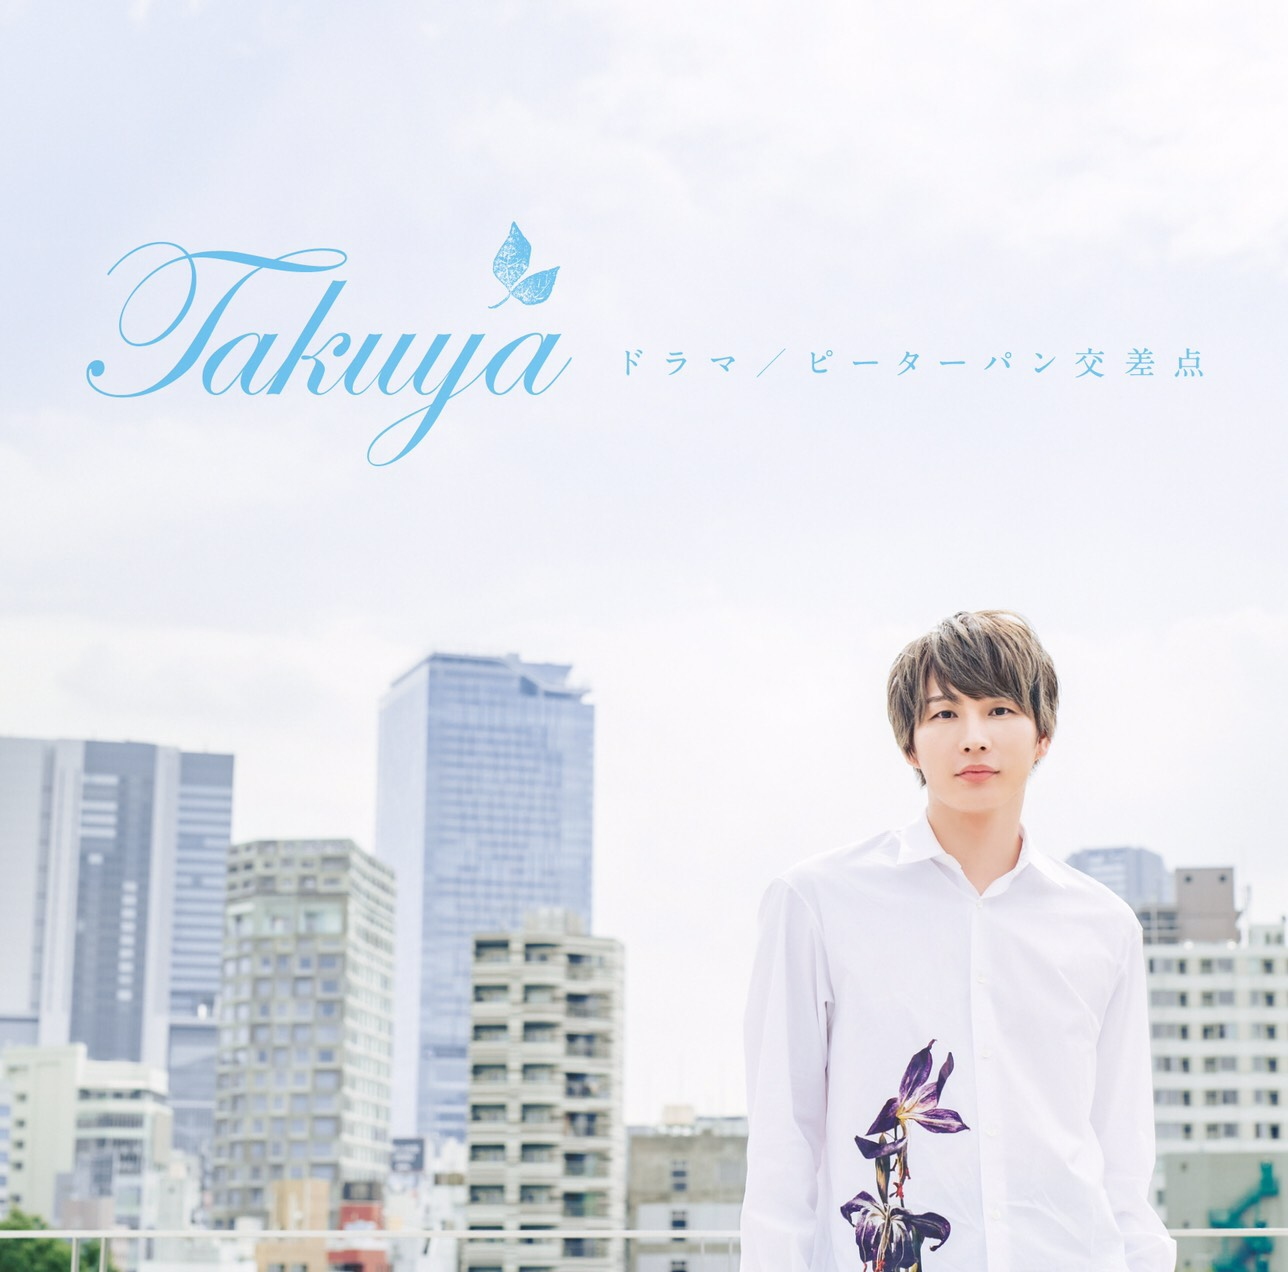 Takuya「ドラマ / ピーターパン交差点」TYPE-C